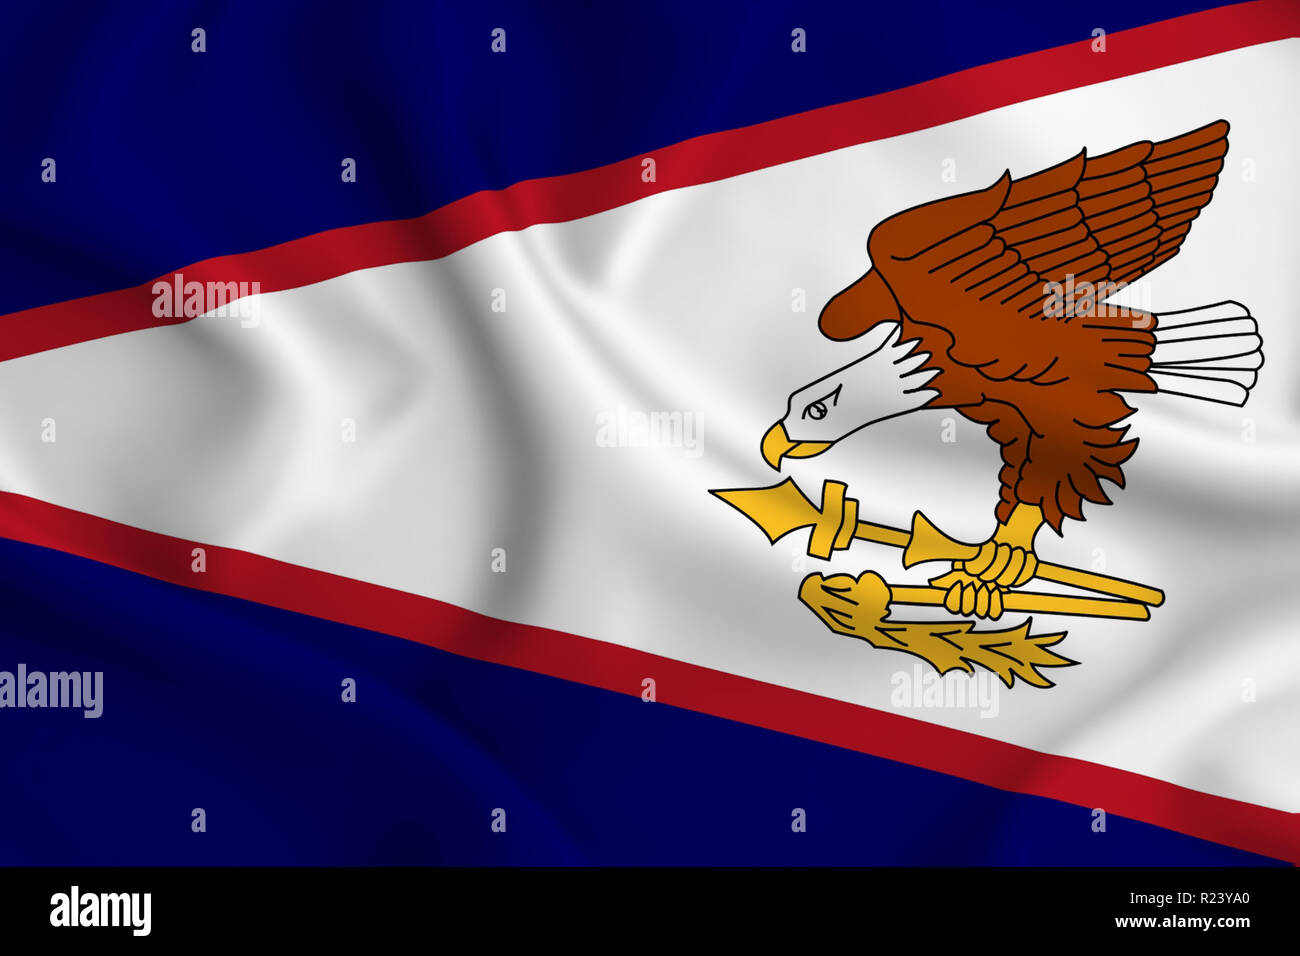 Samoa Waving Flag Stock Photos & Samoa Waving Flag Stock Images - Alamy